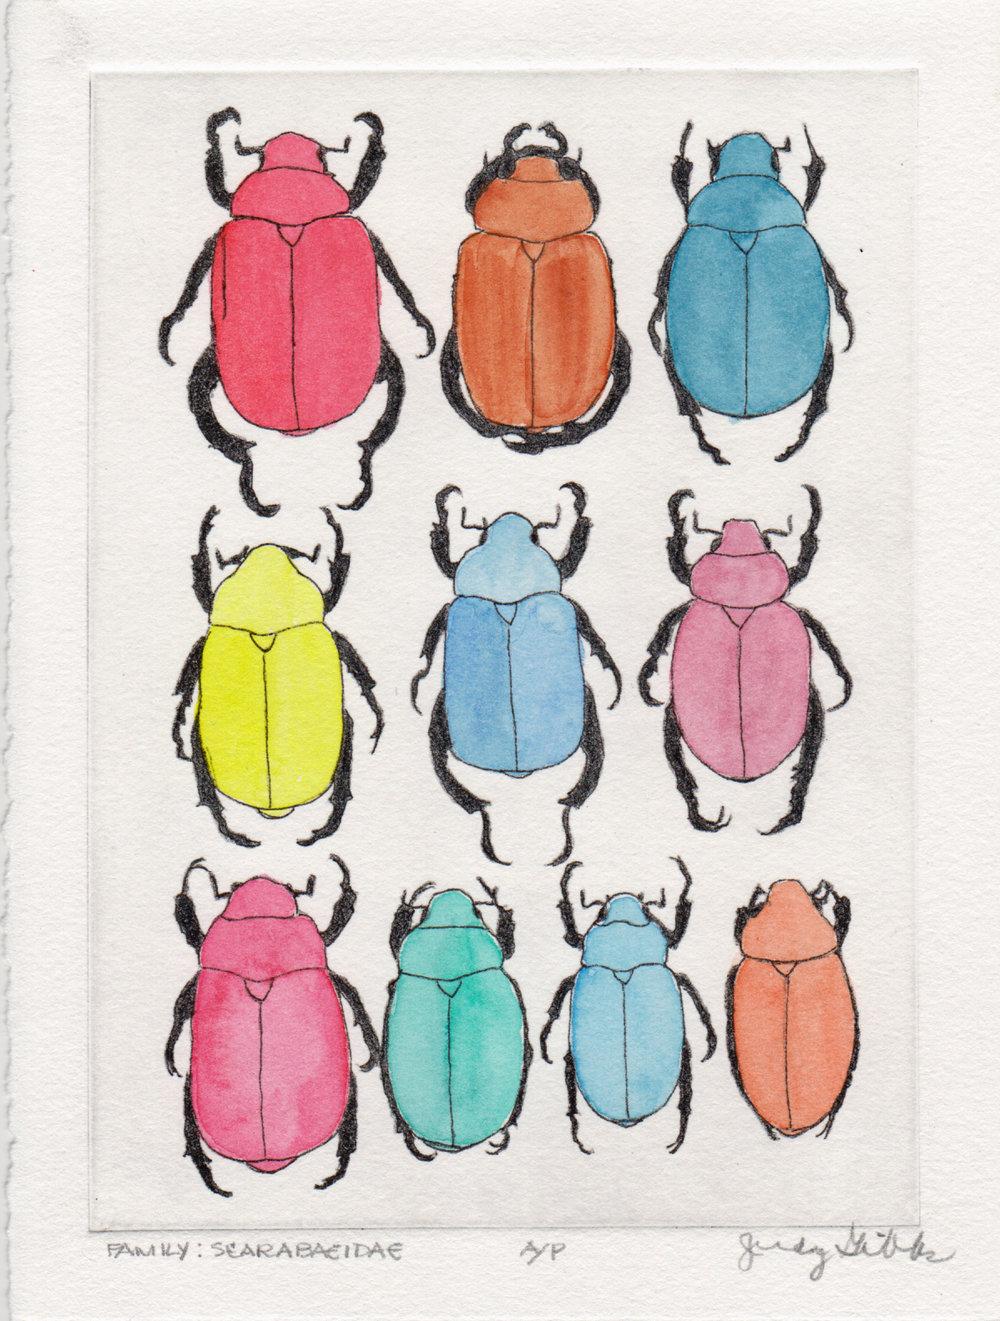 6_Judy Gibbs_Scarabacidae.jpg